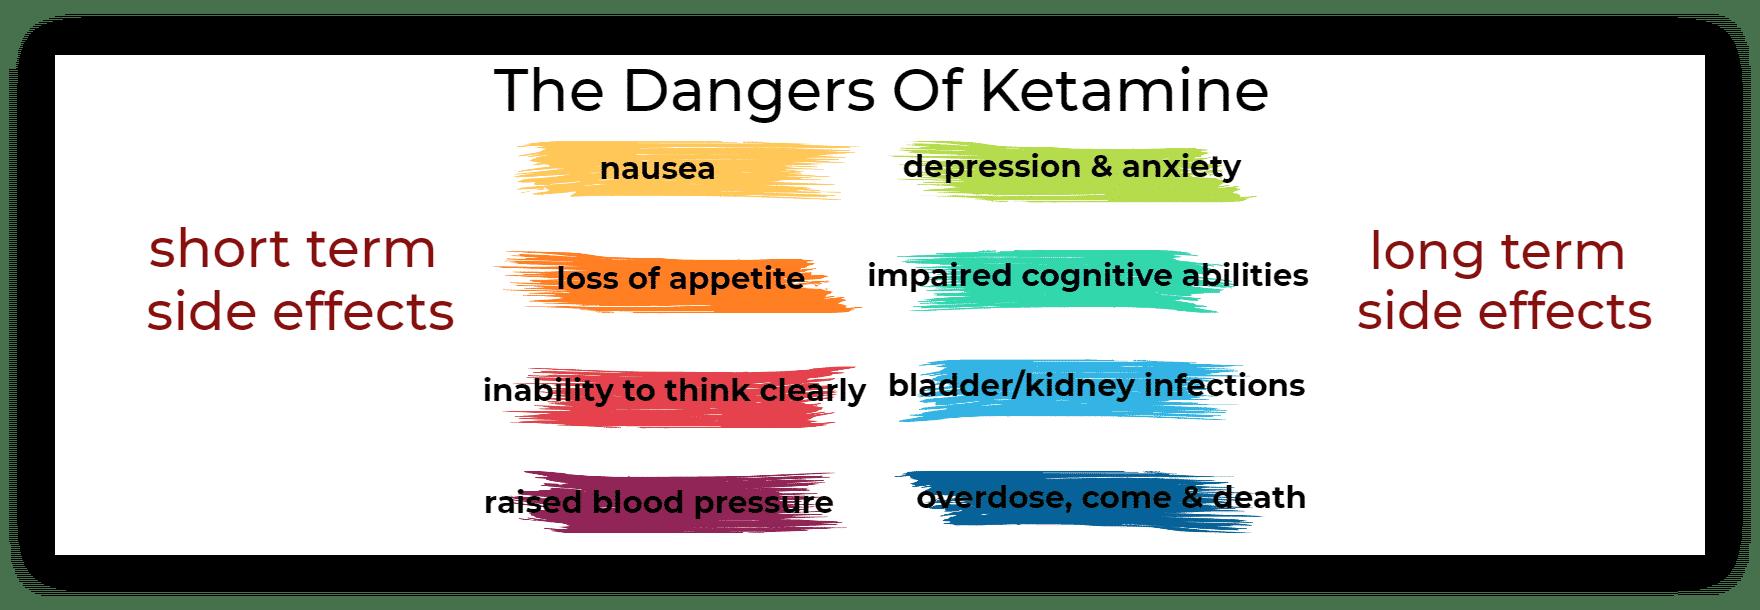 The Dangers Of Ketamine